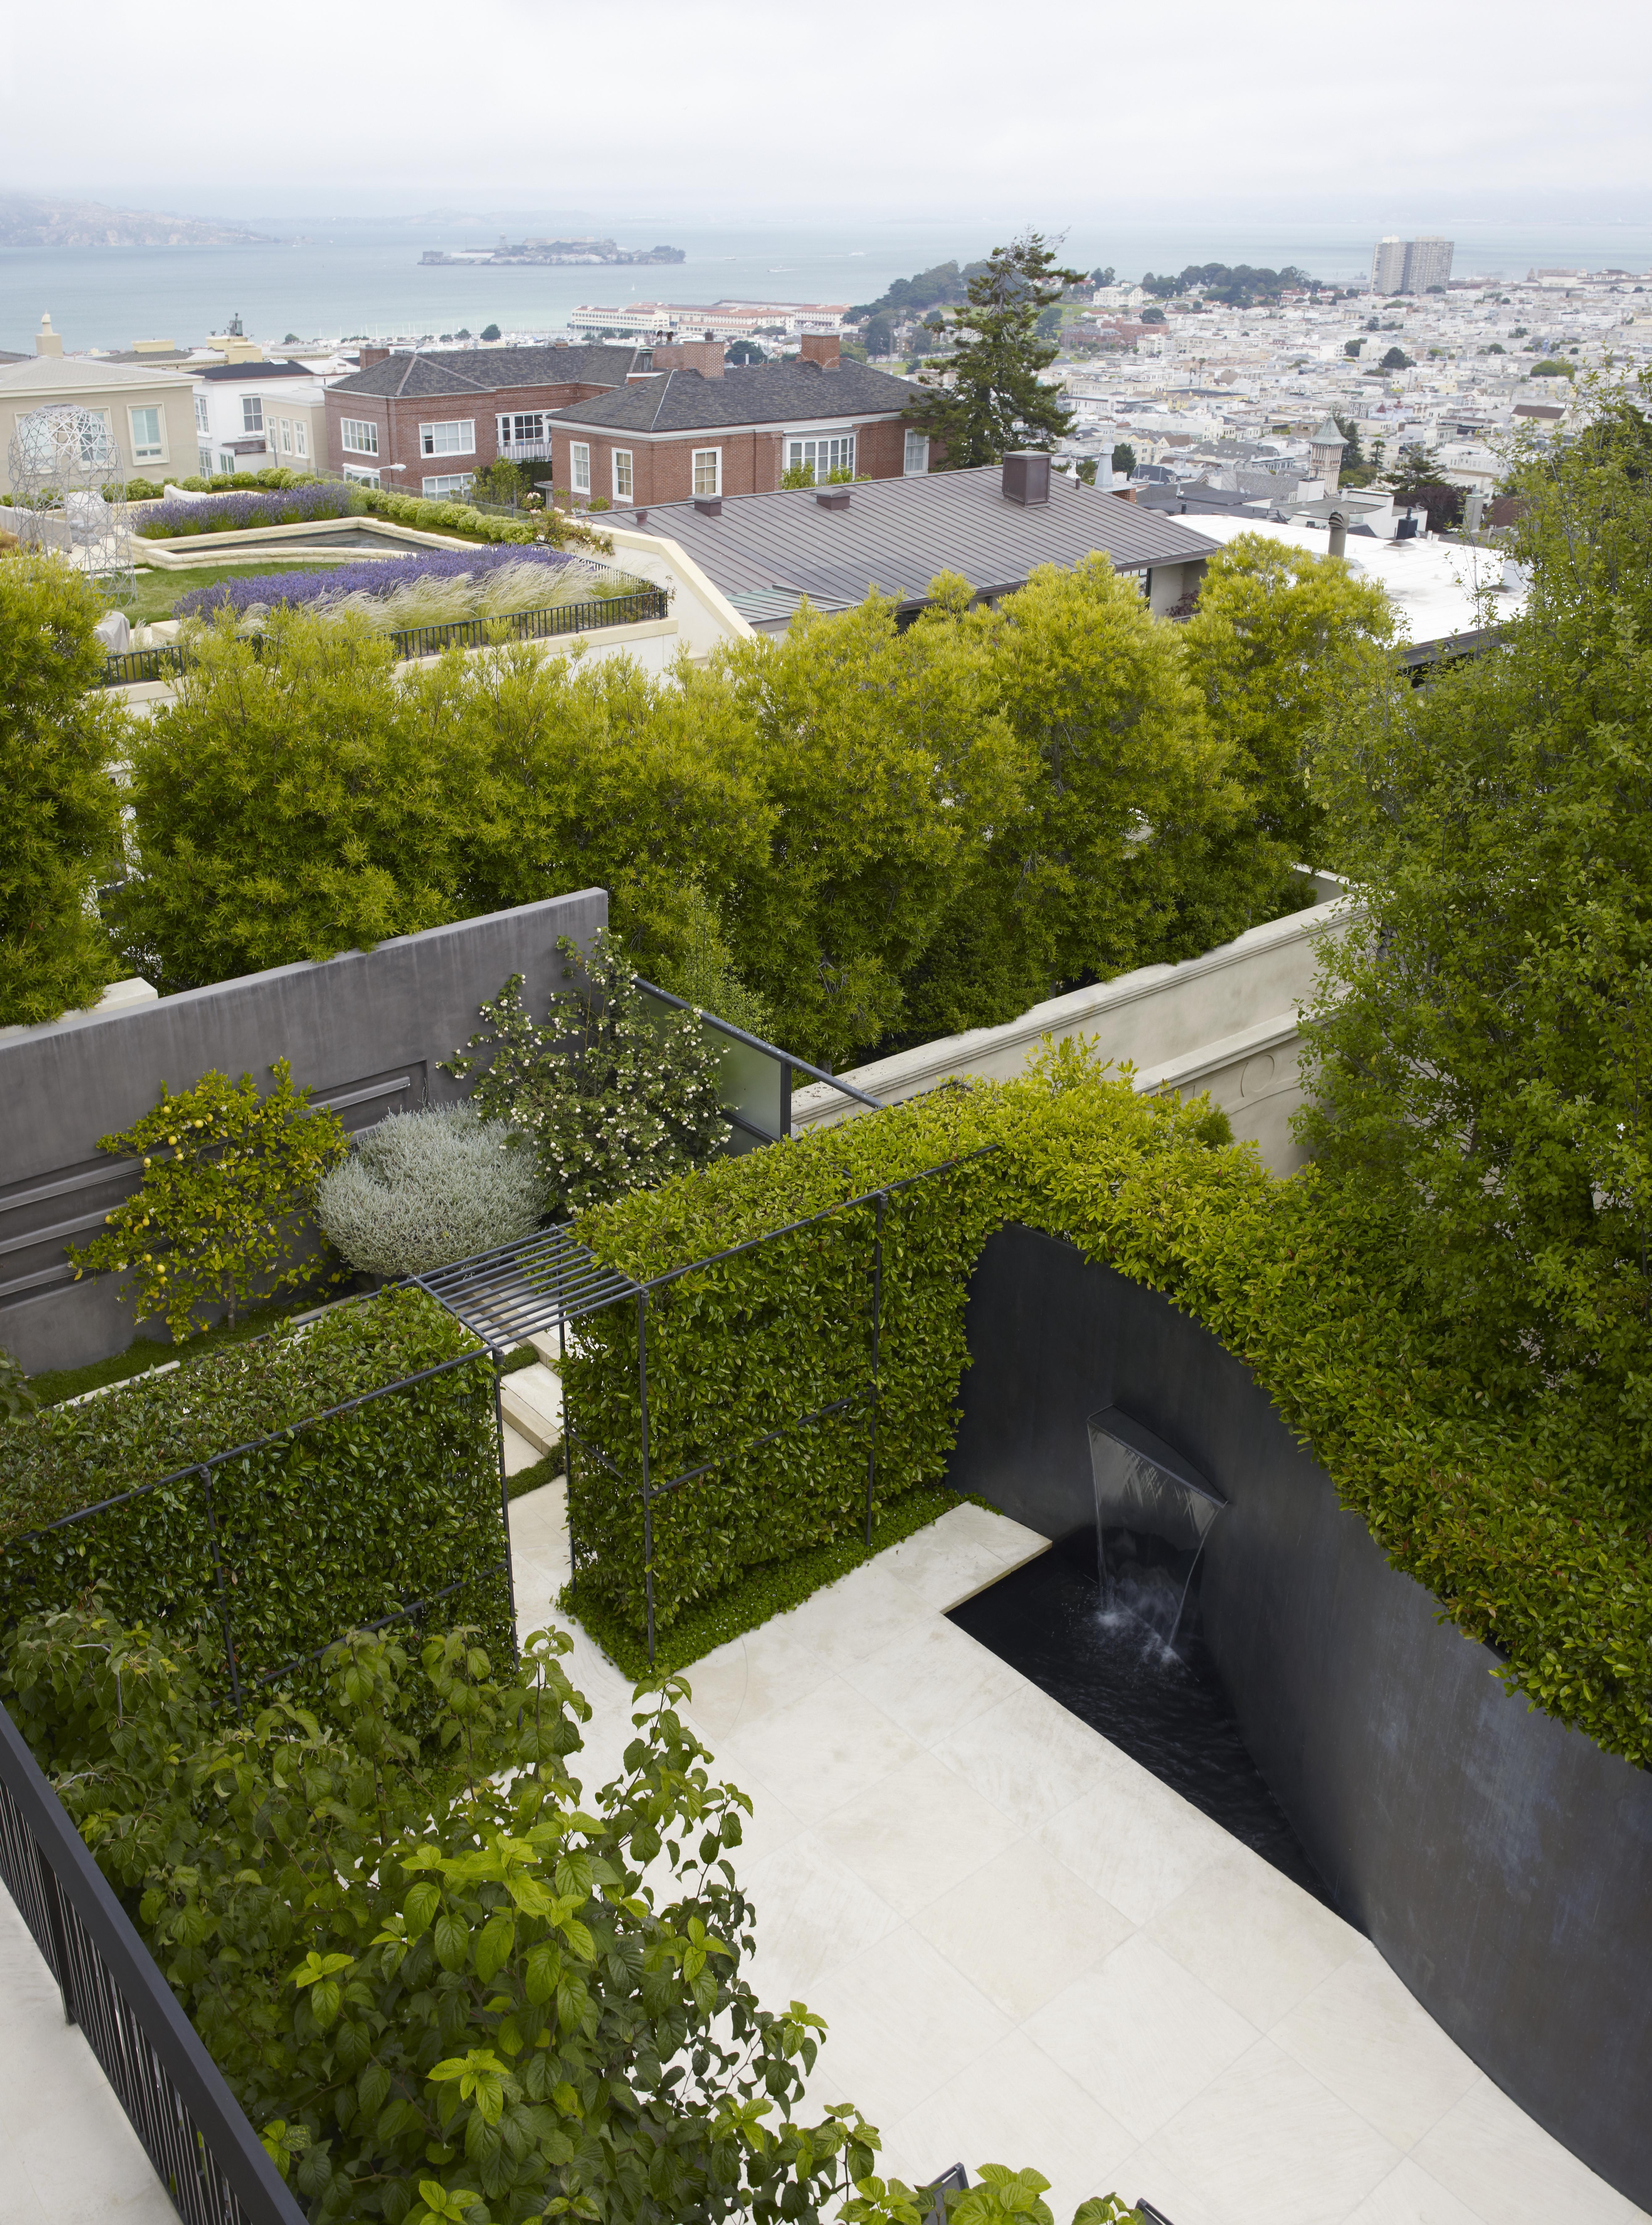 Bay area landscape architects - Download Hi Res Image